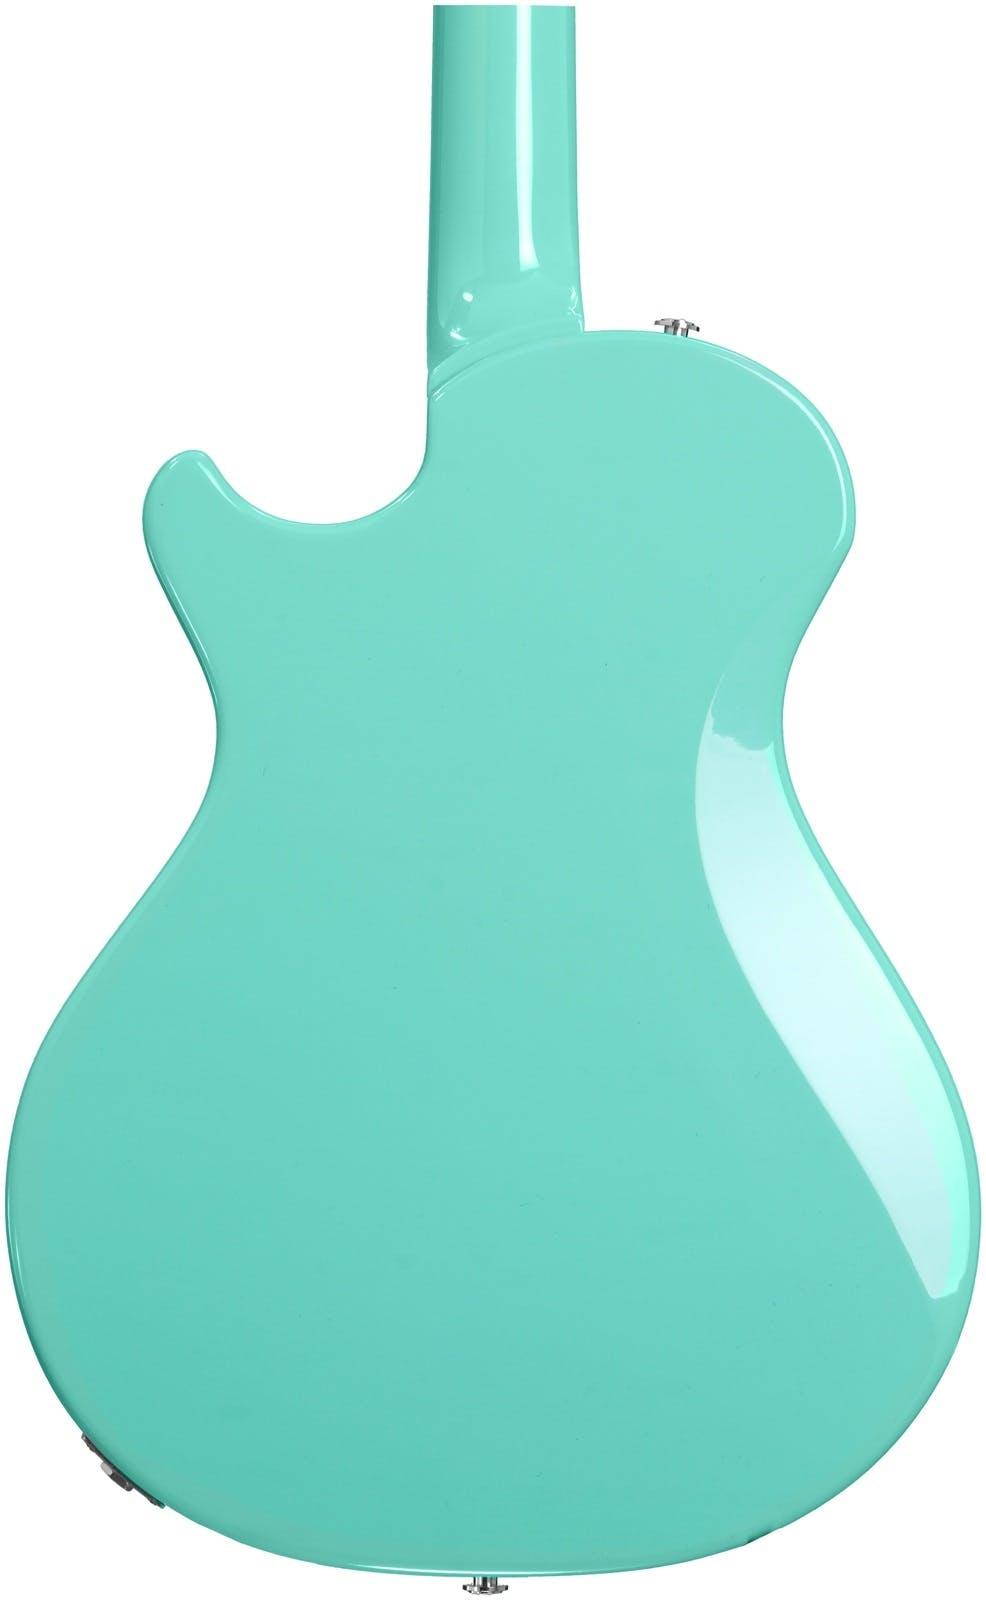 PRS S2 Starla Electric Guitar in Sea Foam Green - Andertons Music Co.